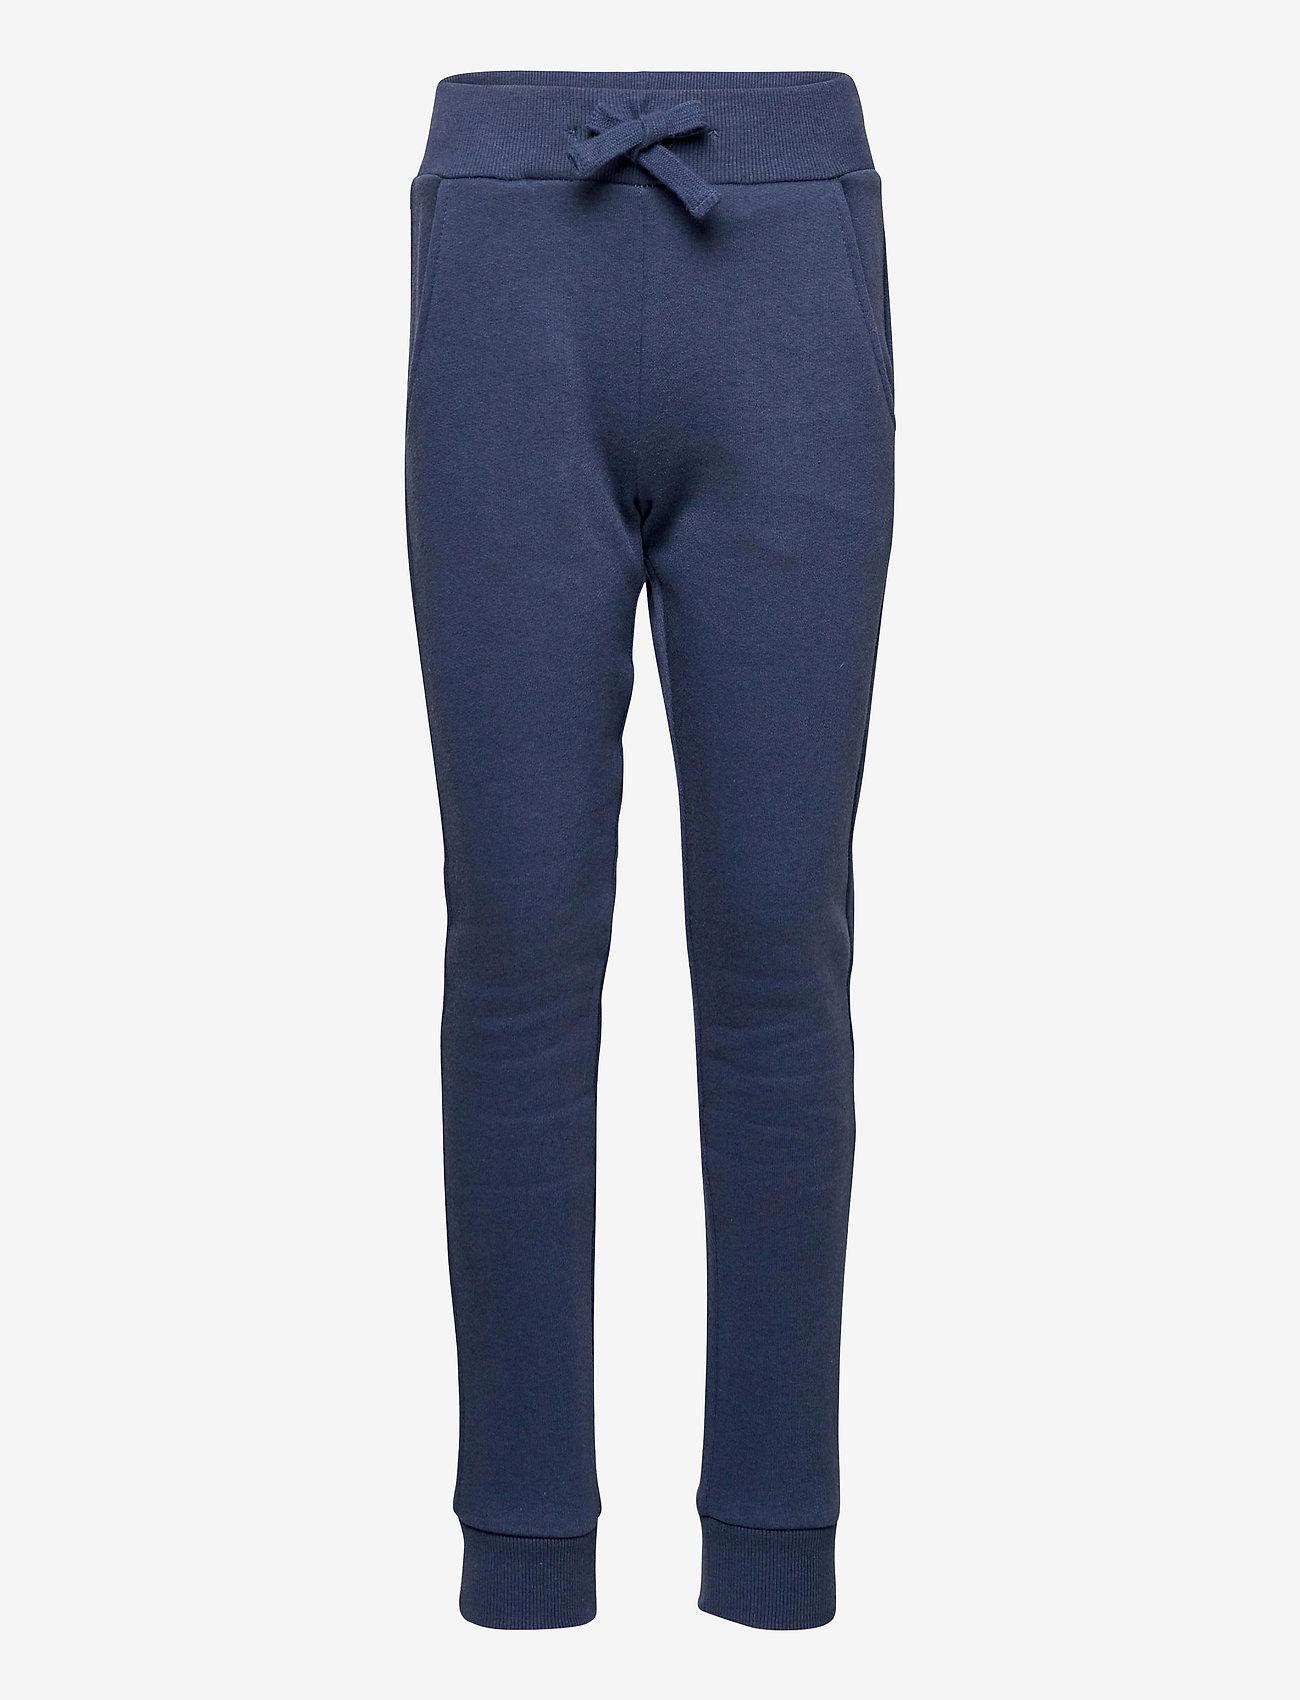 Lindex - Trousers Jogging Basic Fashion - joggingbroek - blue - 0